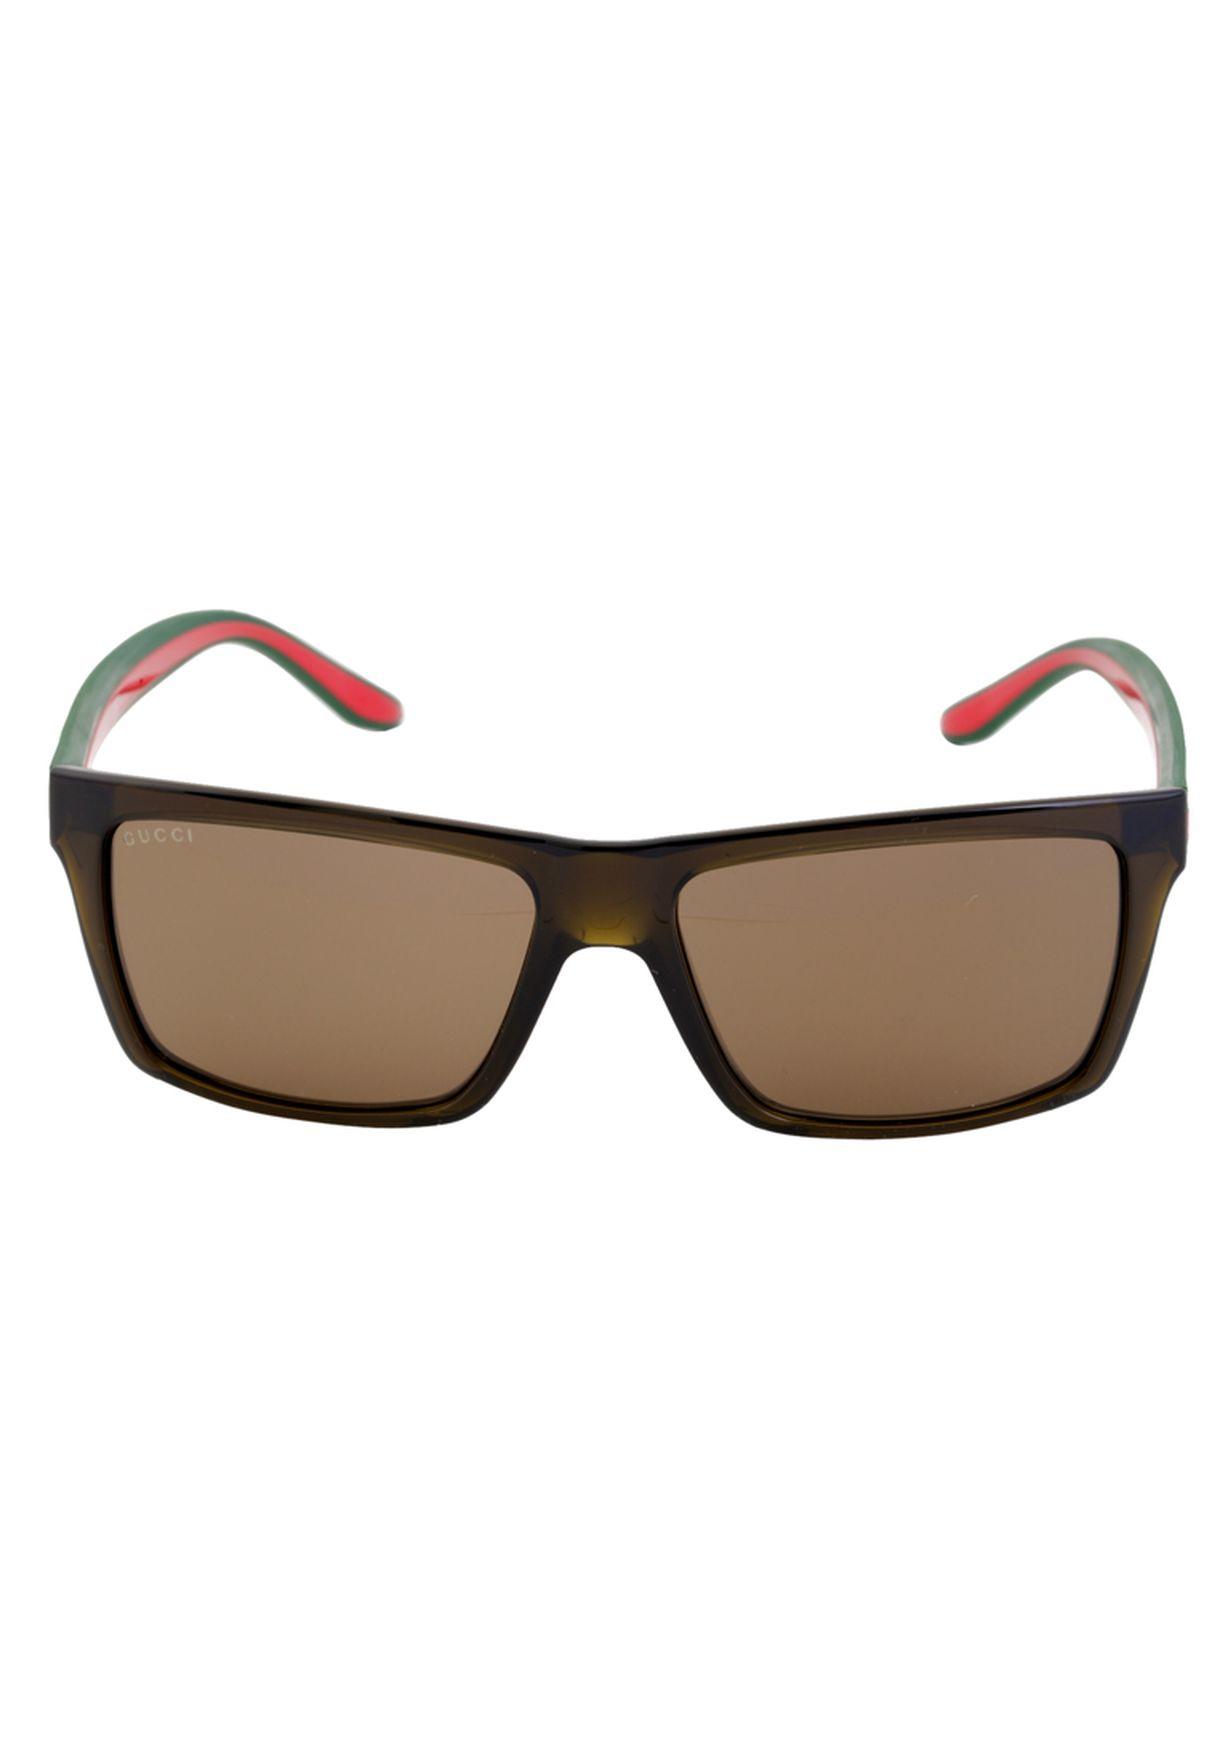 27b9bbda6a1 Shop Gucci browns Gus Luxury Sunglasses for Men in Kuwait - GU797AC02KZL